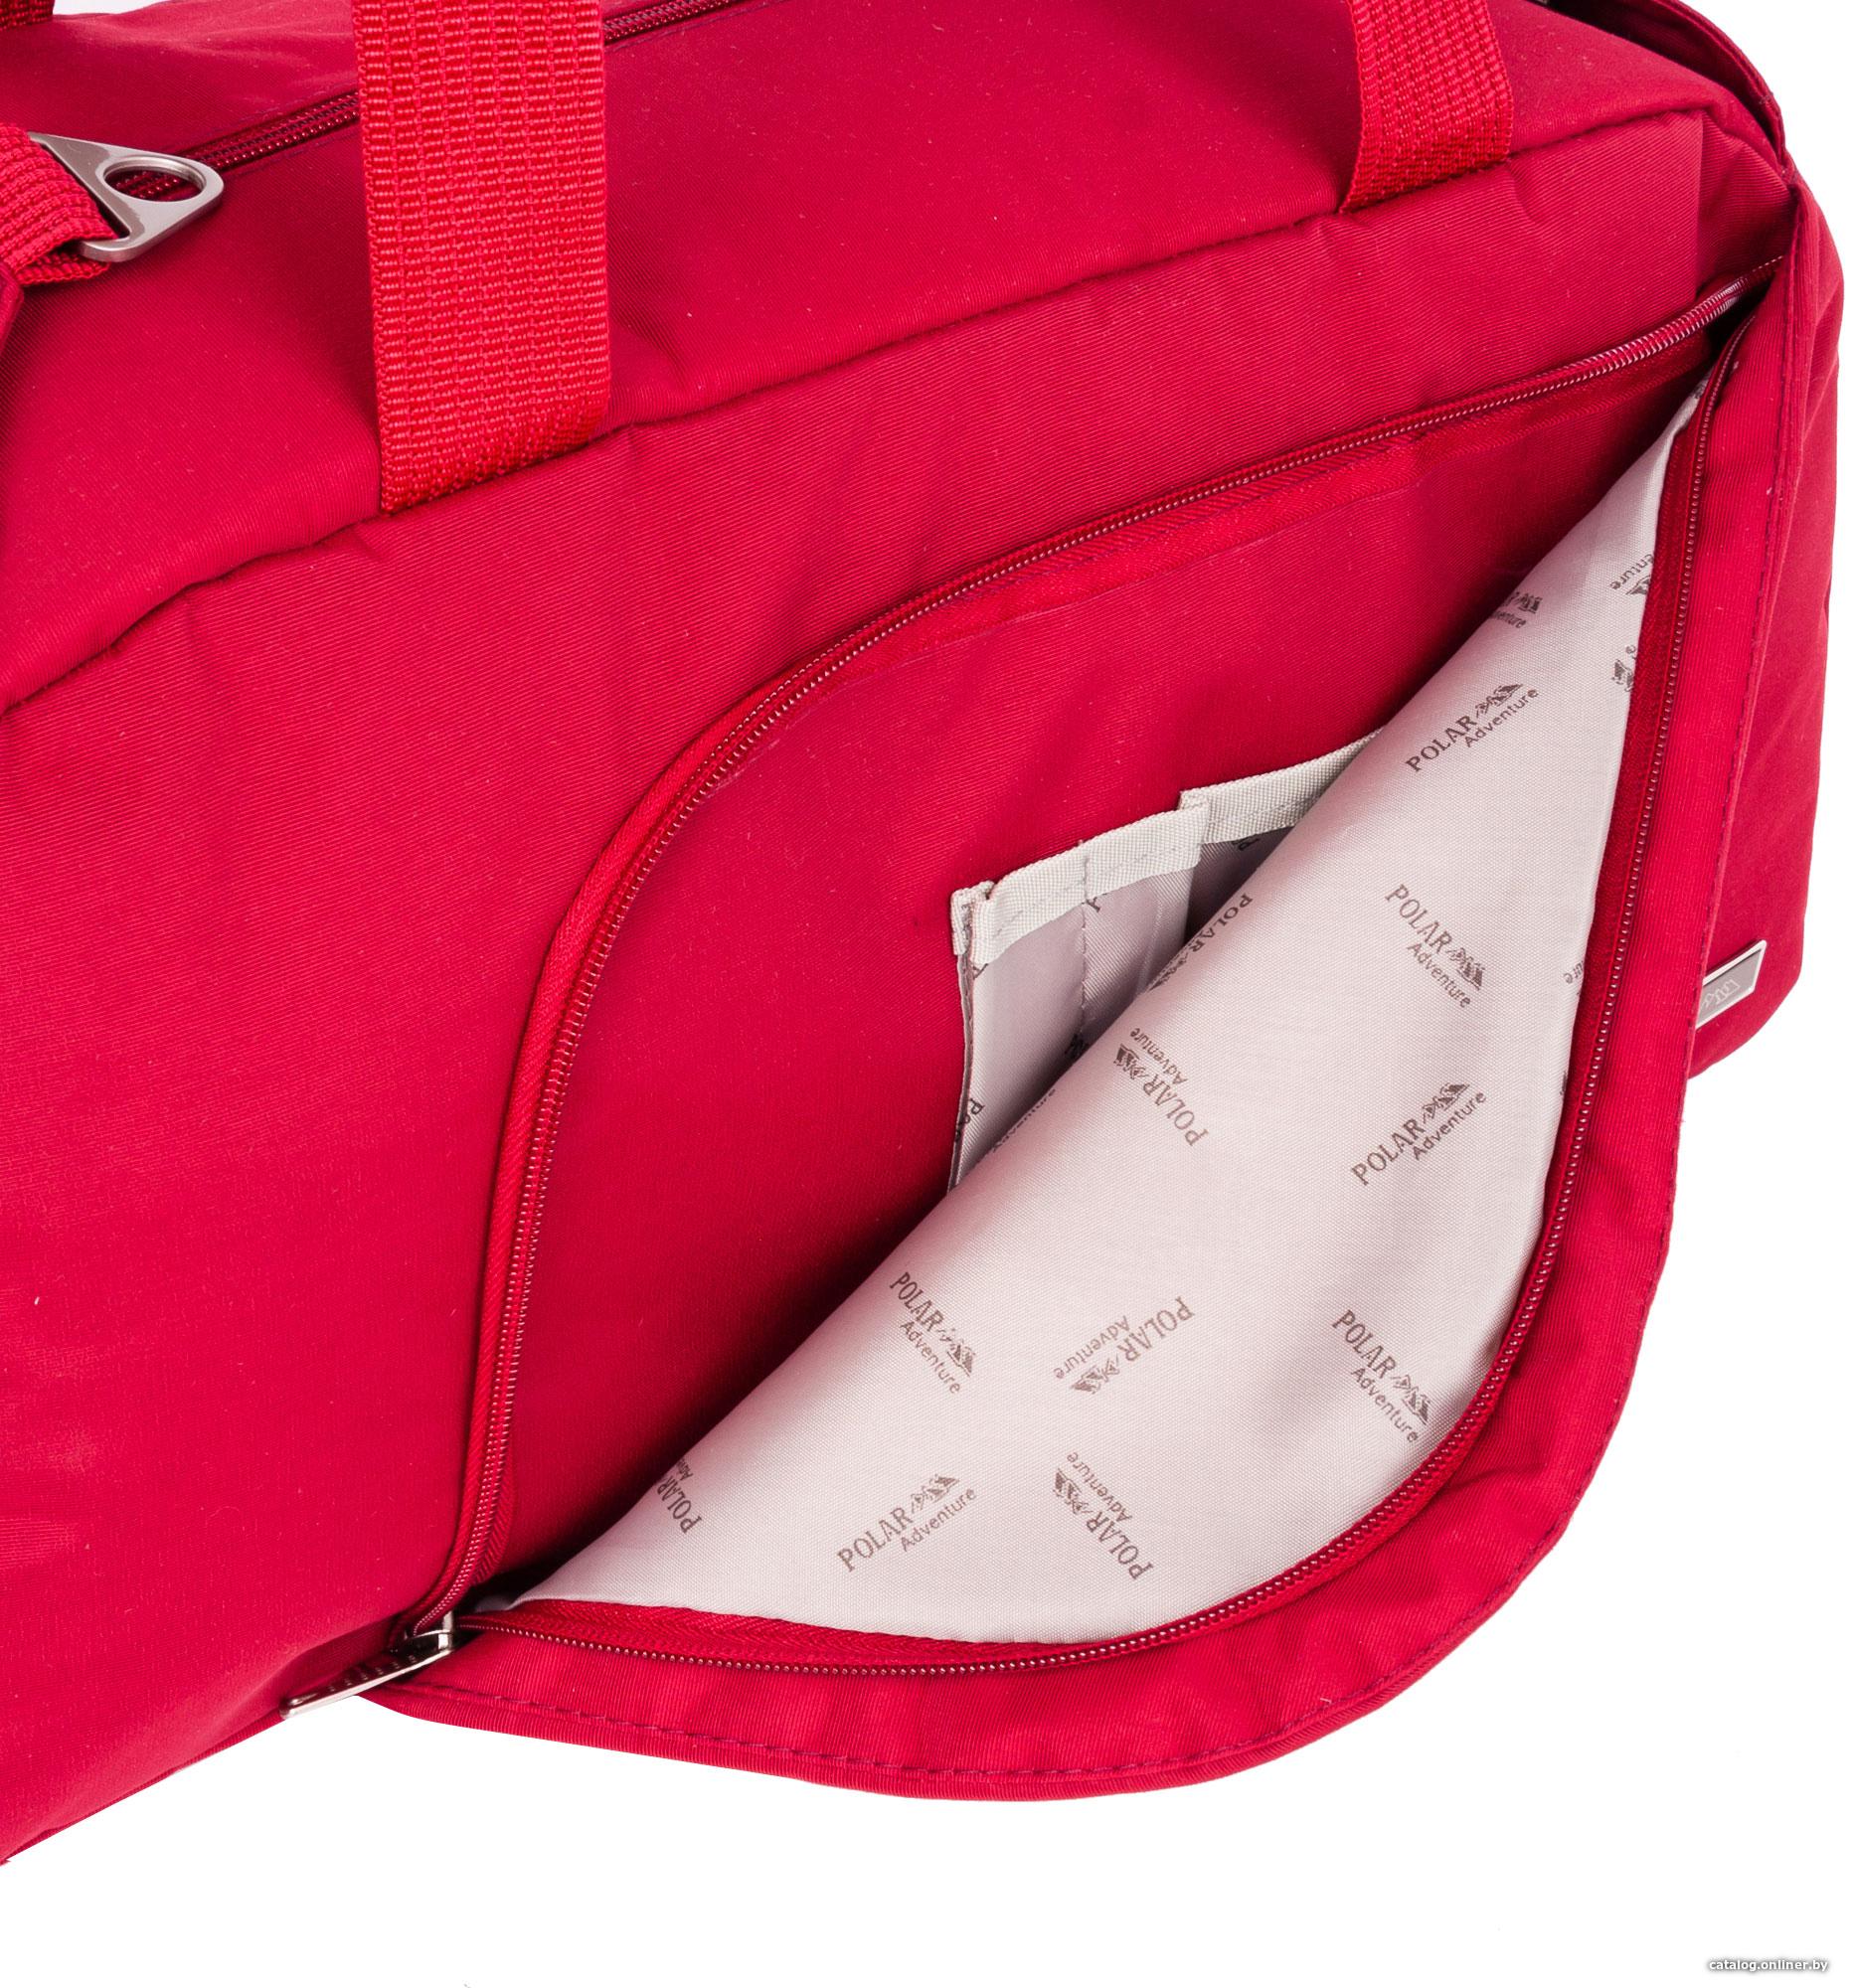 26704515496f Polar П7072 (серый) сумку купить в Минске